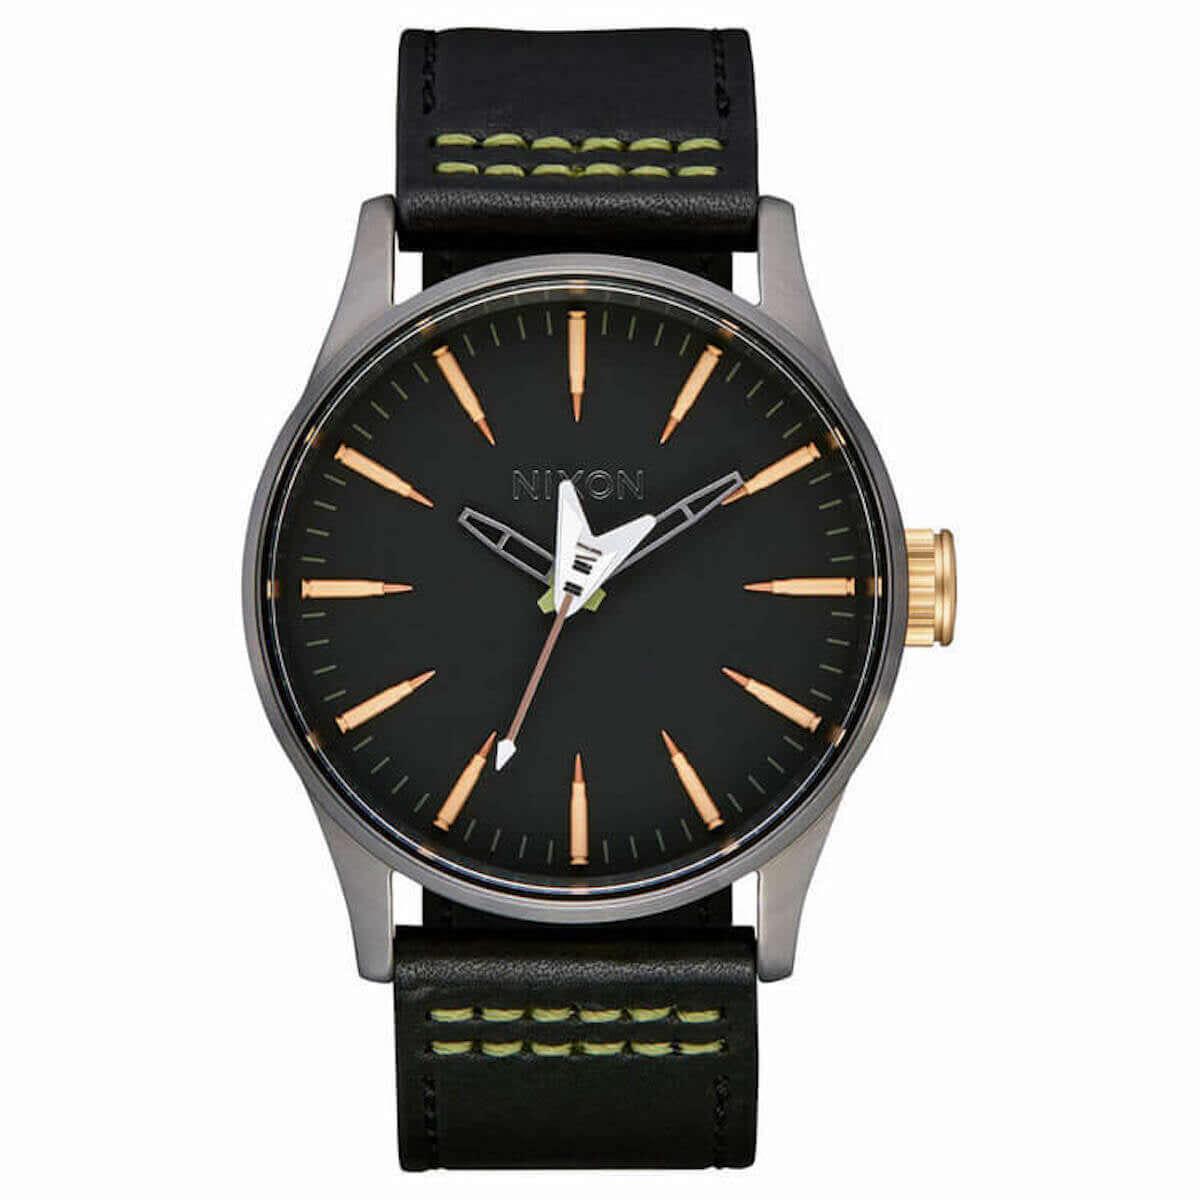 METALLICA X NIXON メタリカの名盤が腕時計に! music181112_nixon-metallica_8-1200x1200